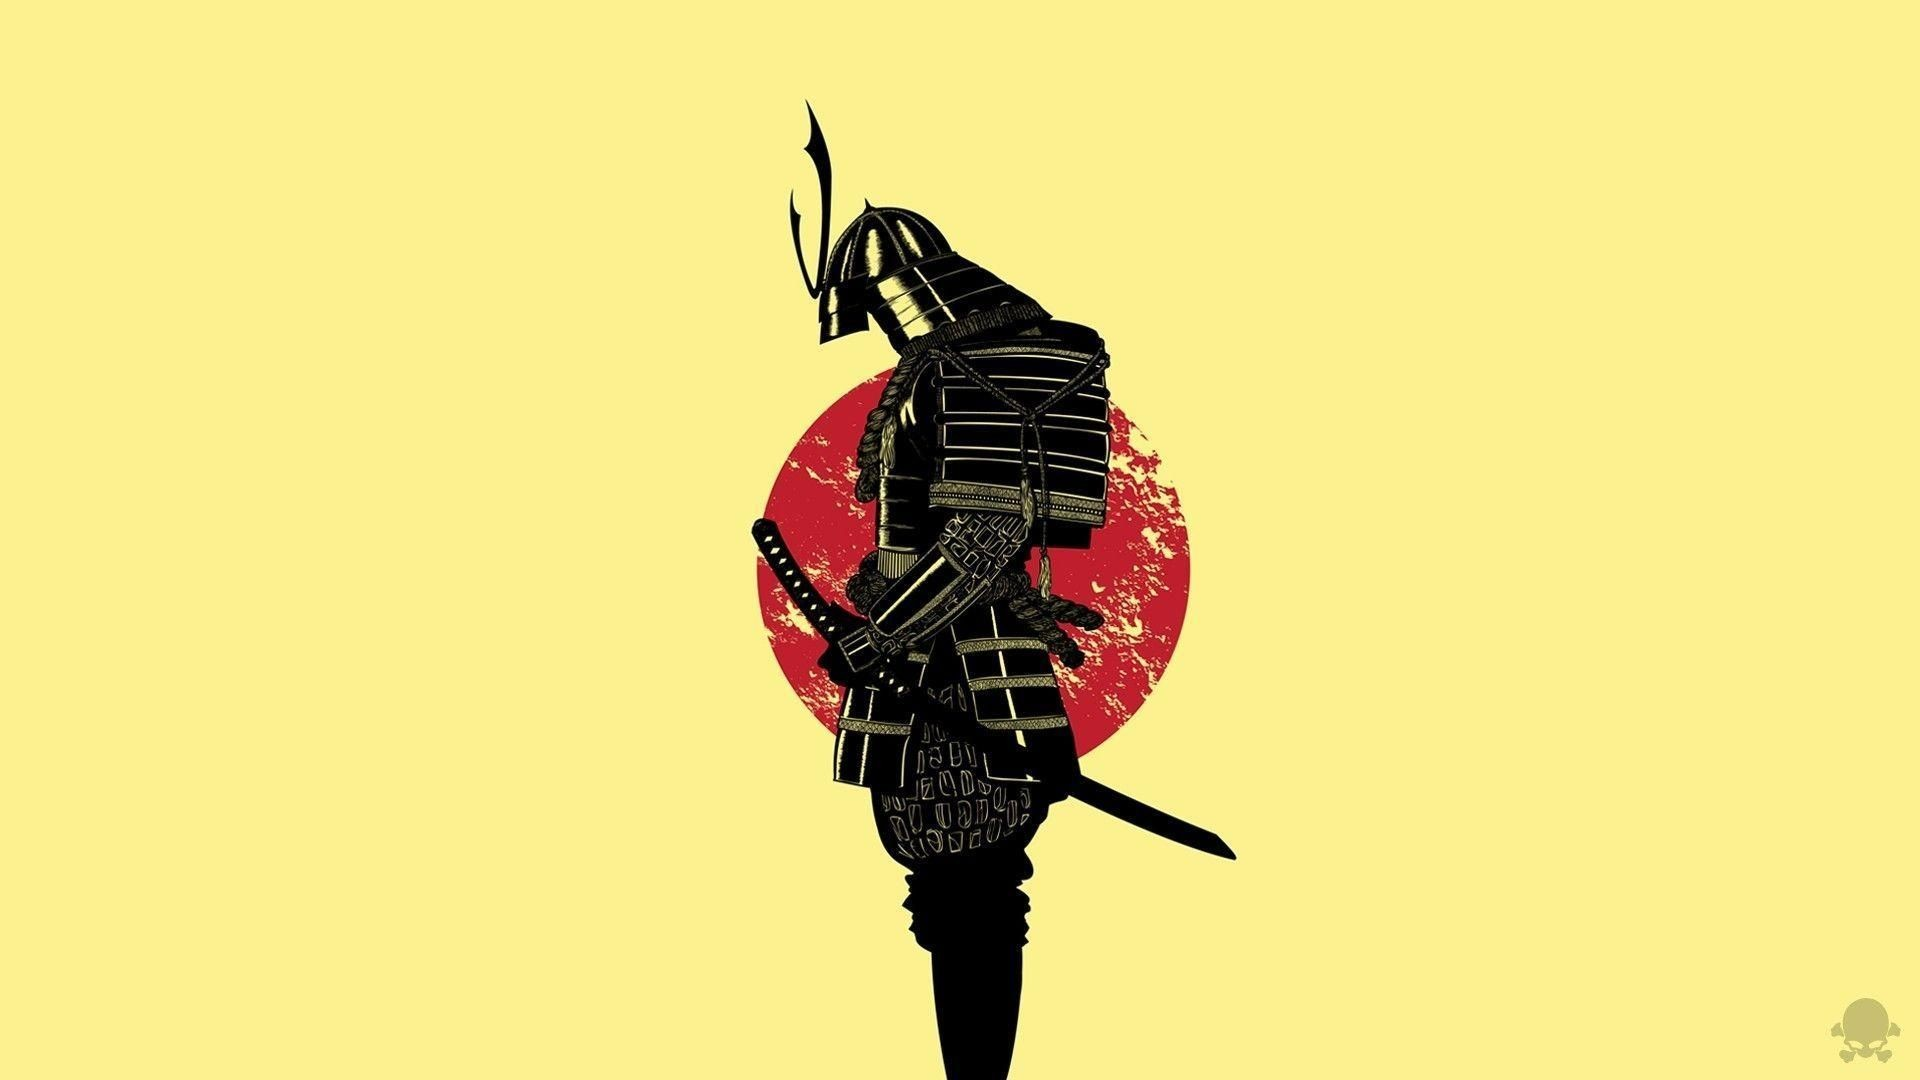 Res: 1920x1080, Japanese Art Samurai Girl | Wallpapers Samurai - Wallpaper Cave